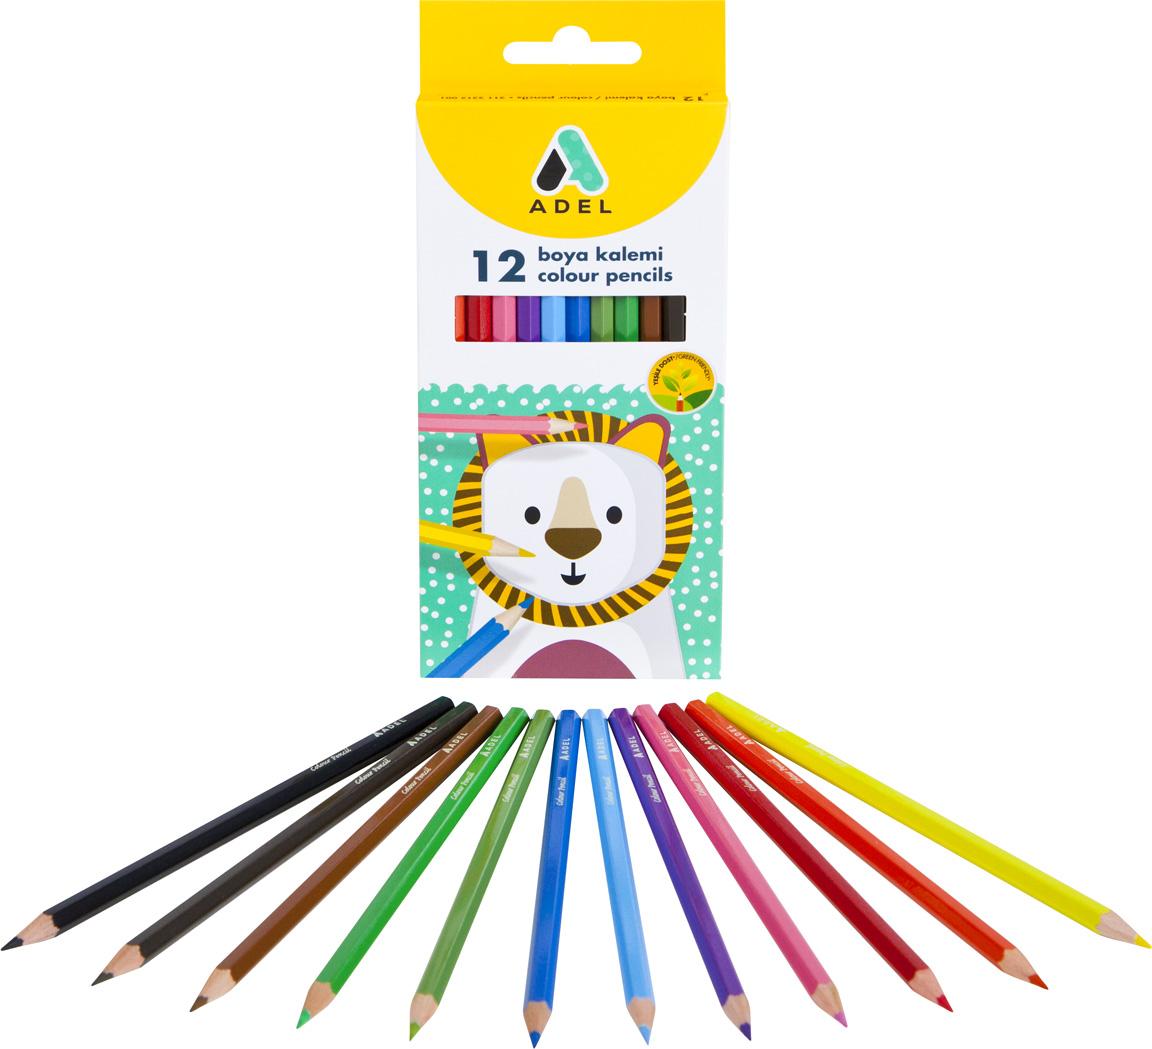 Adel Набор цветных карандашей 12 шт